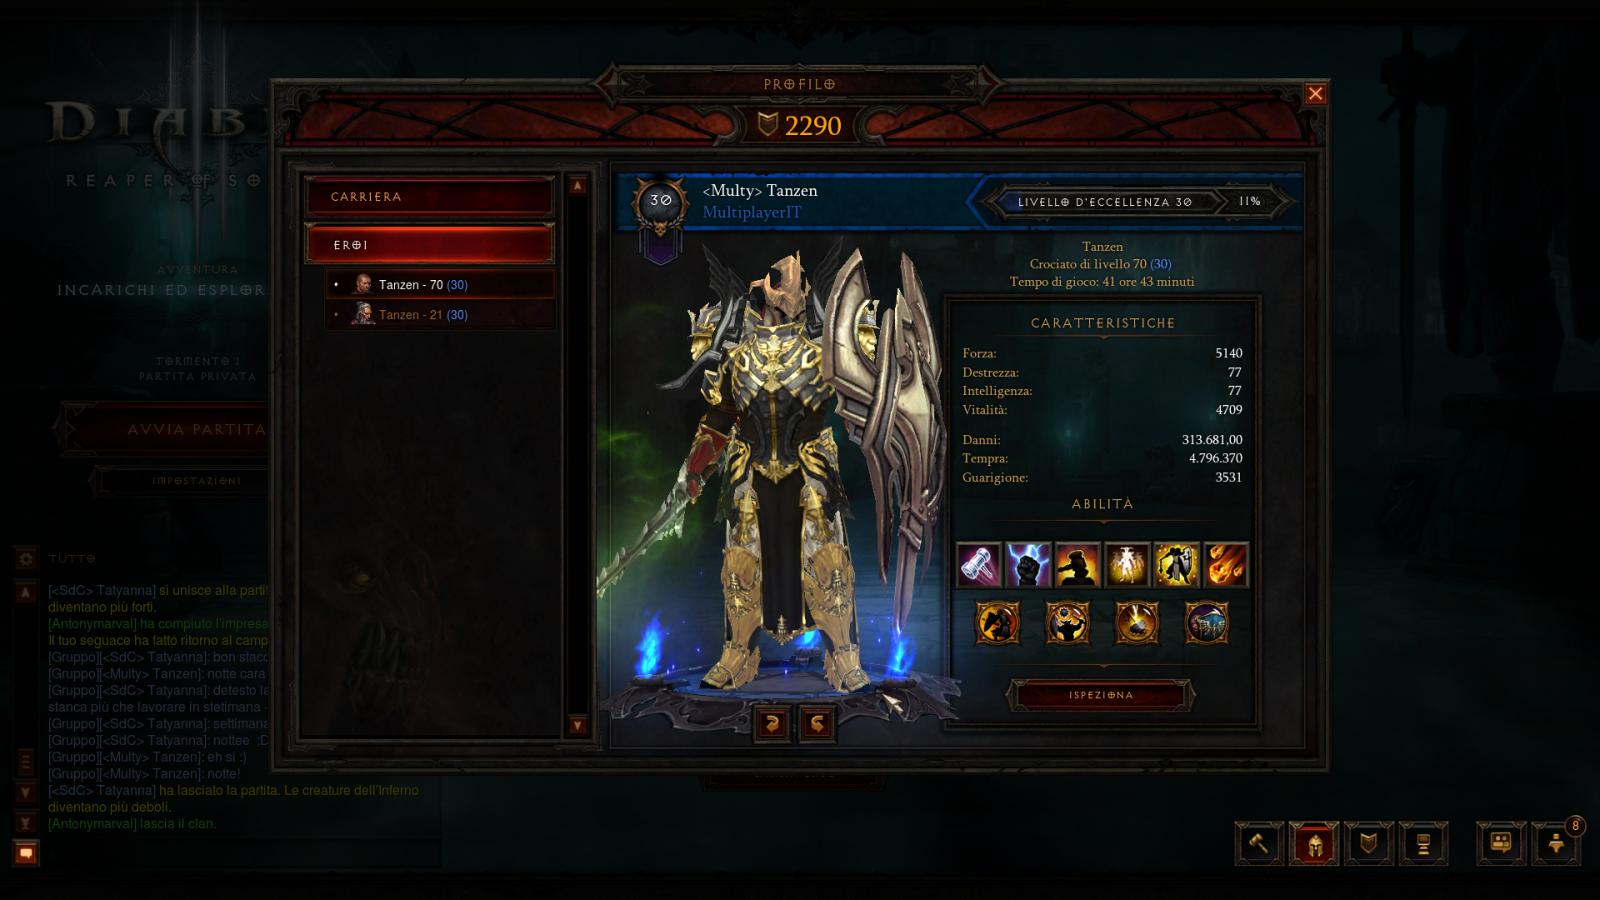 Diablo III 2014-04-14 00-59-36-88